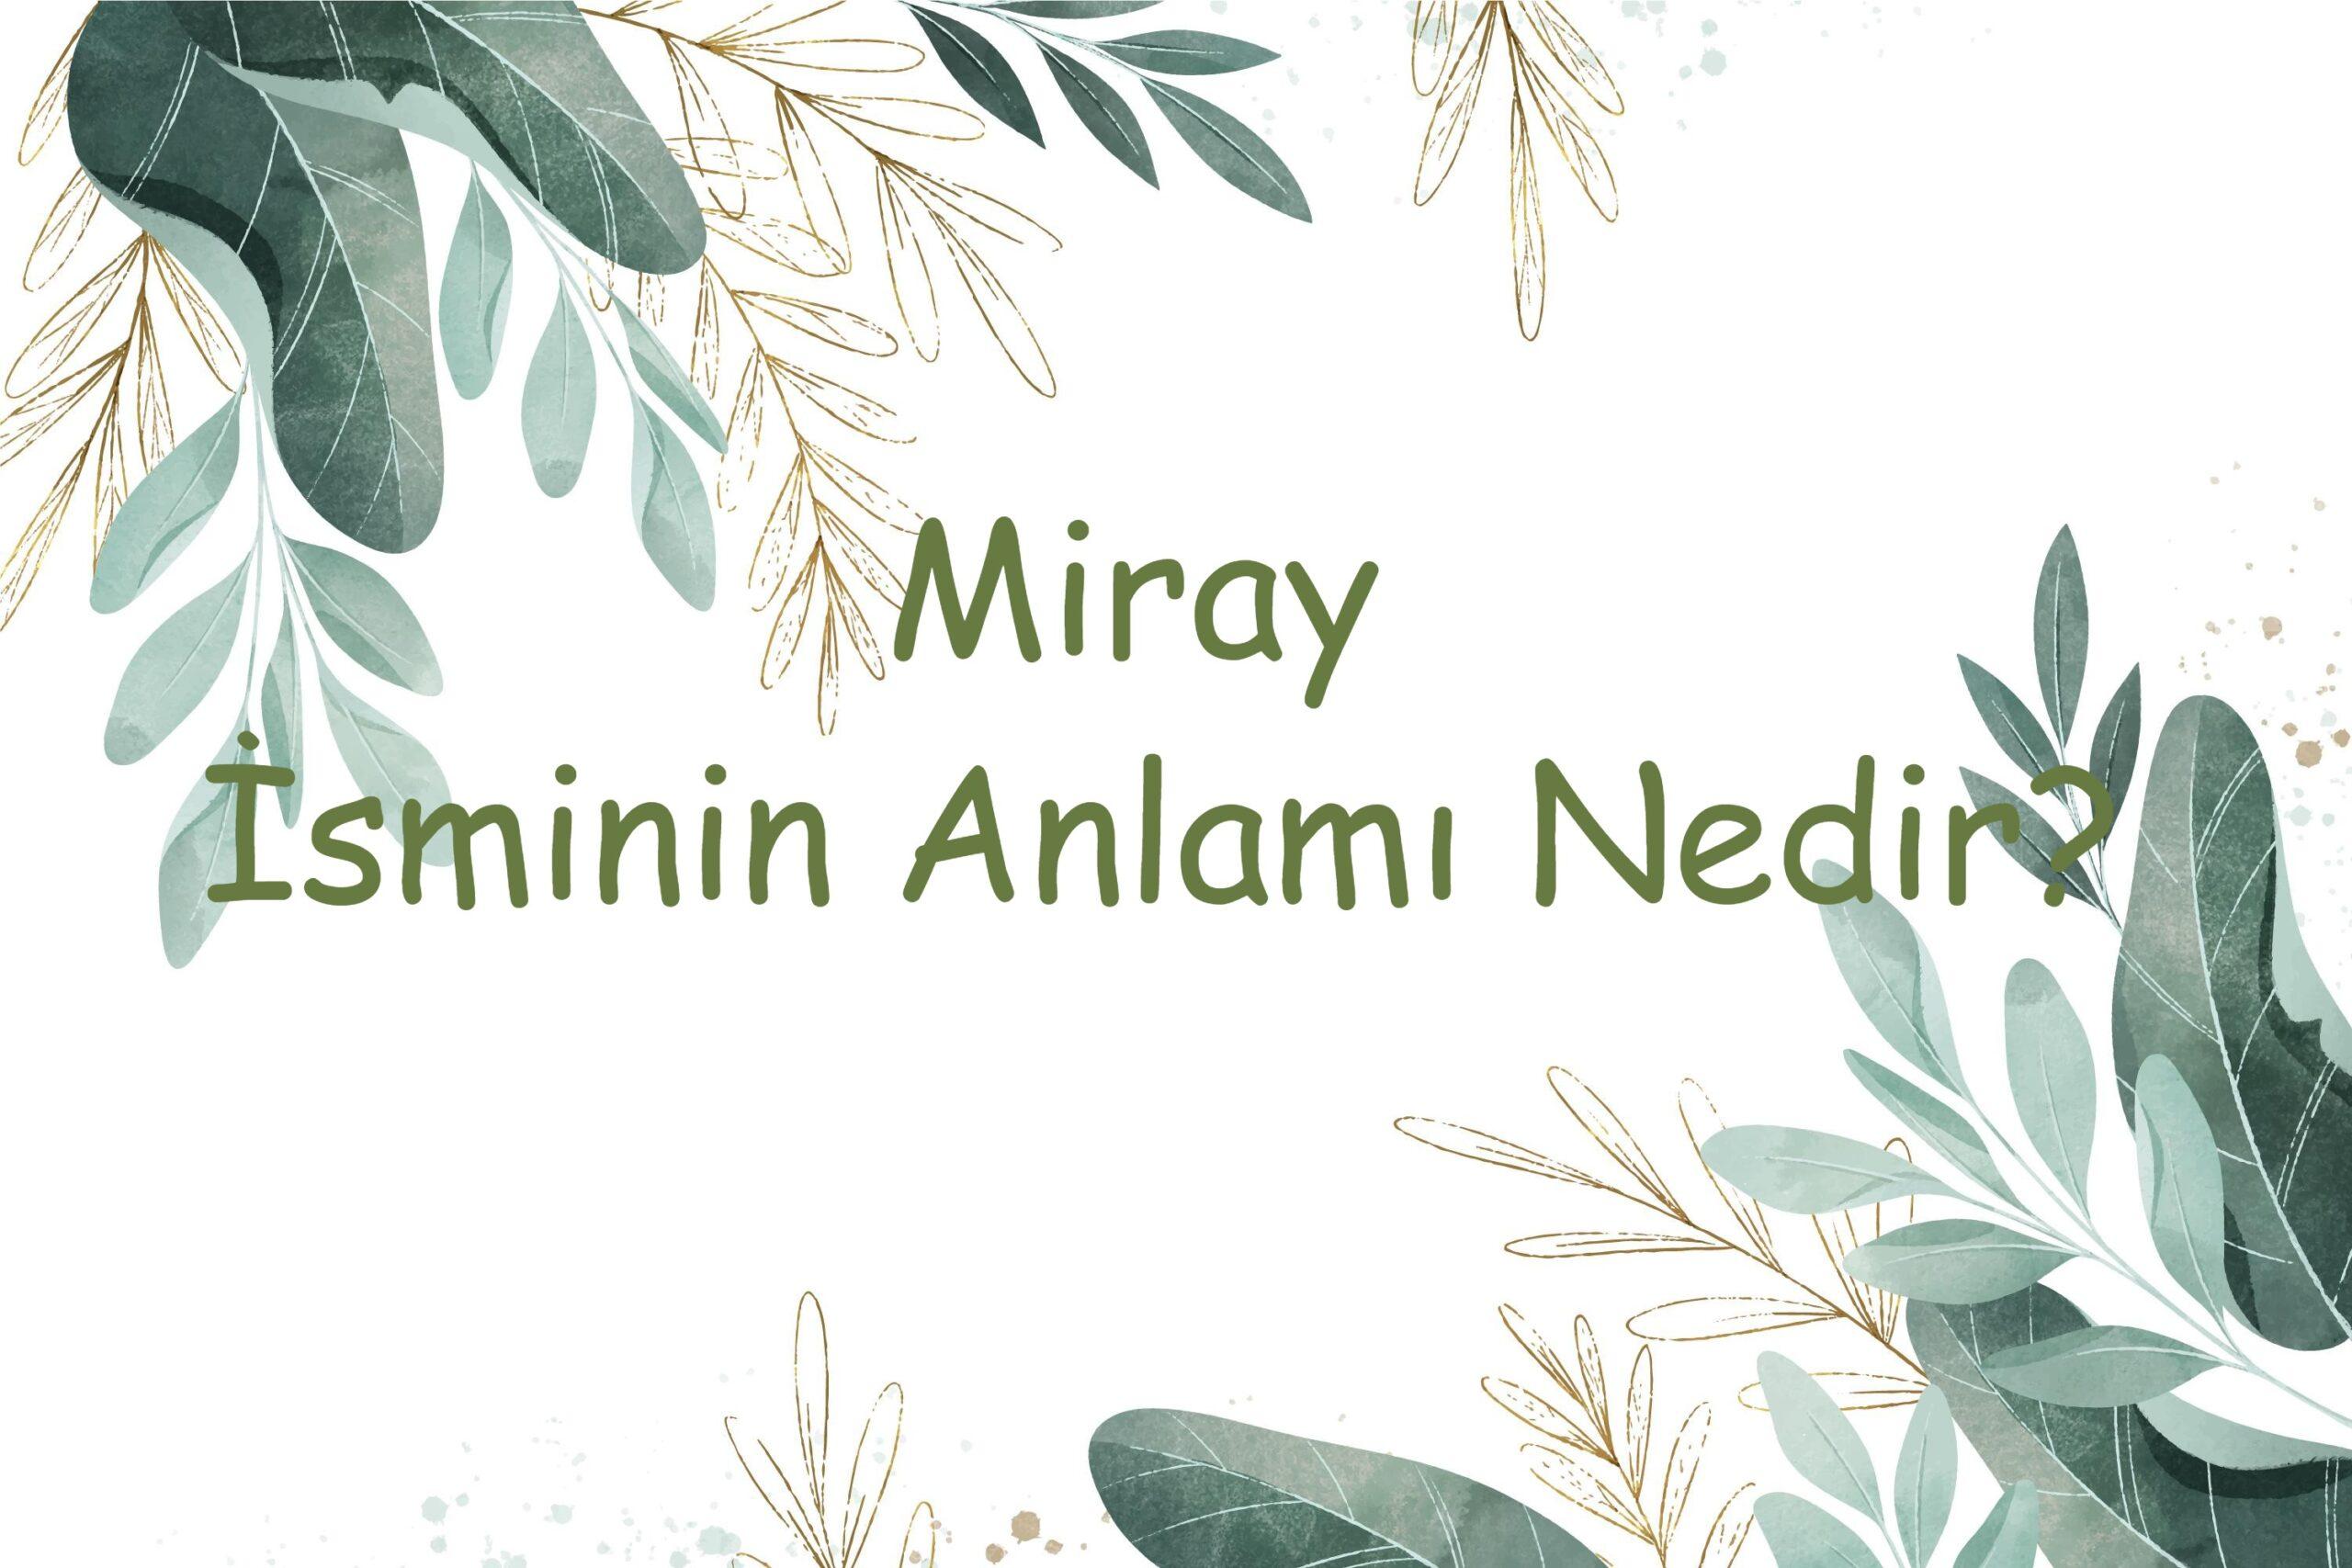 Farsça kökenli olan Miray isminin anlamı nedir?